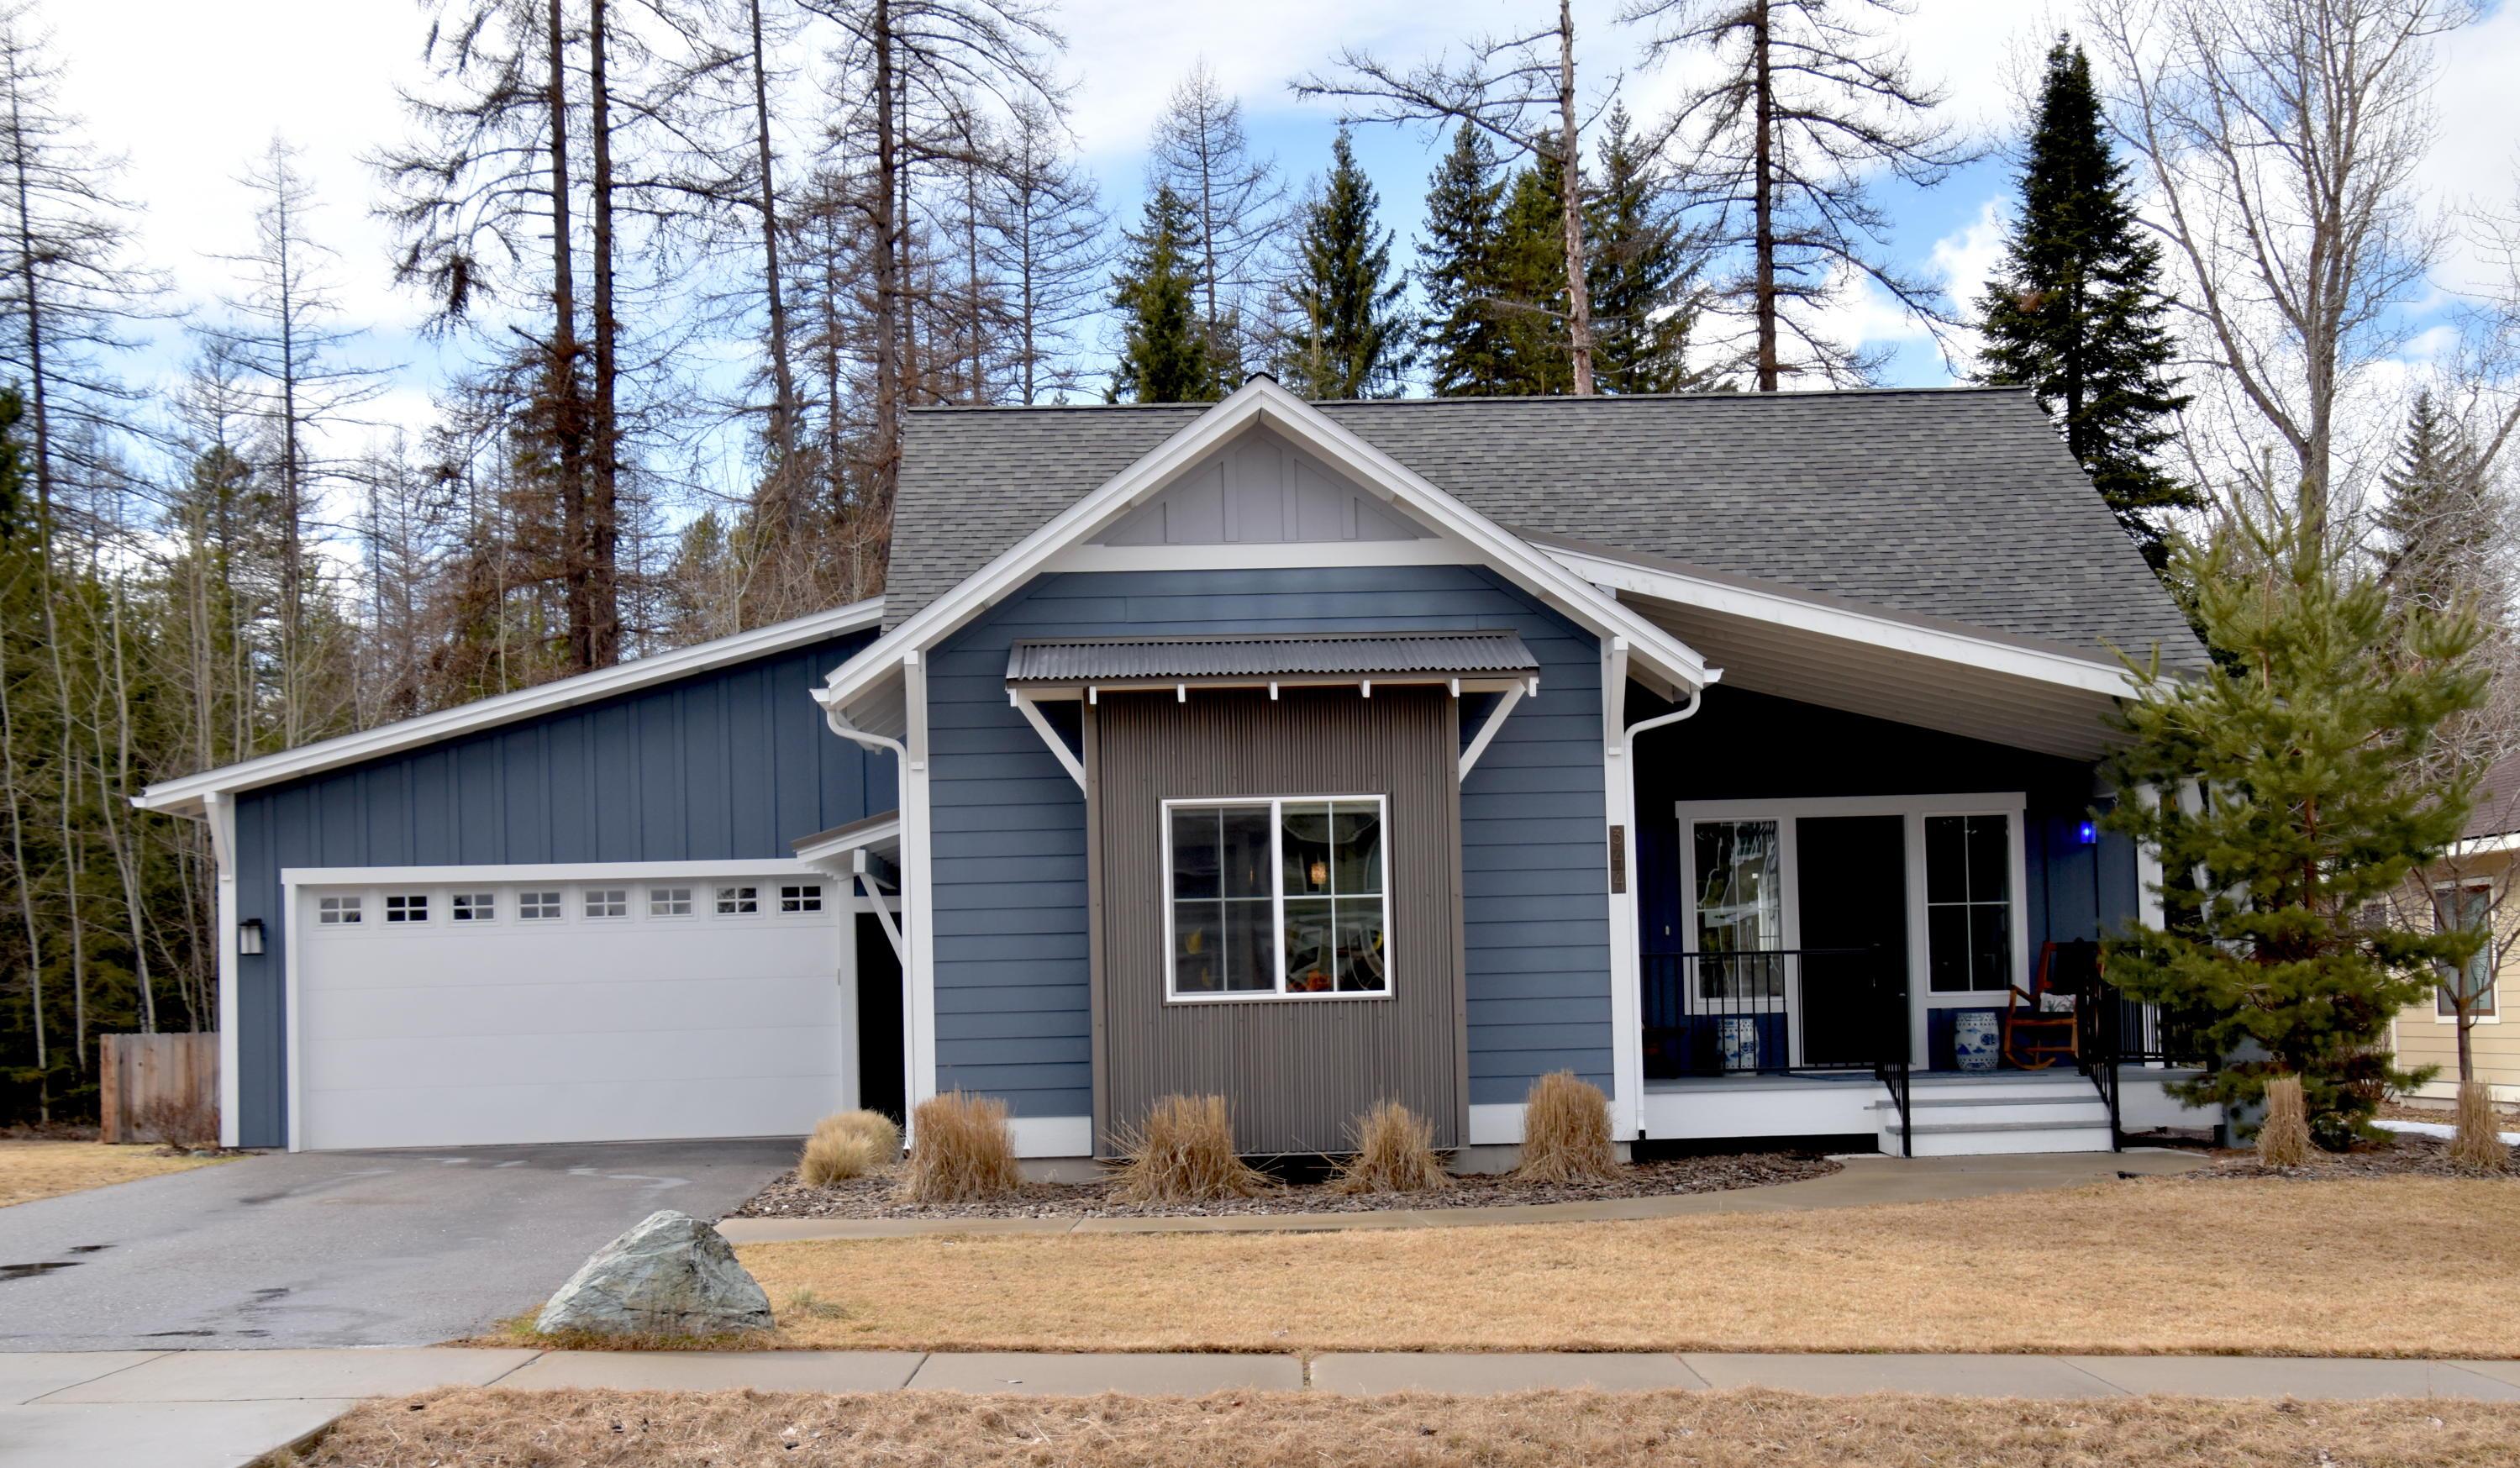 344 Sawtooth Drive, Whitefish, MT 59937